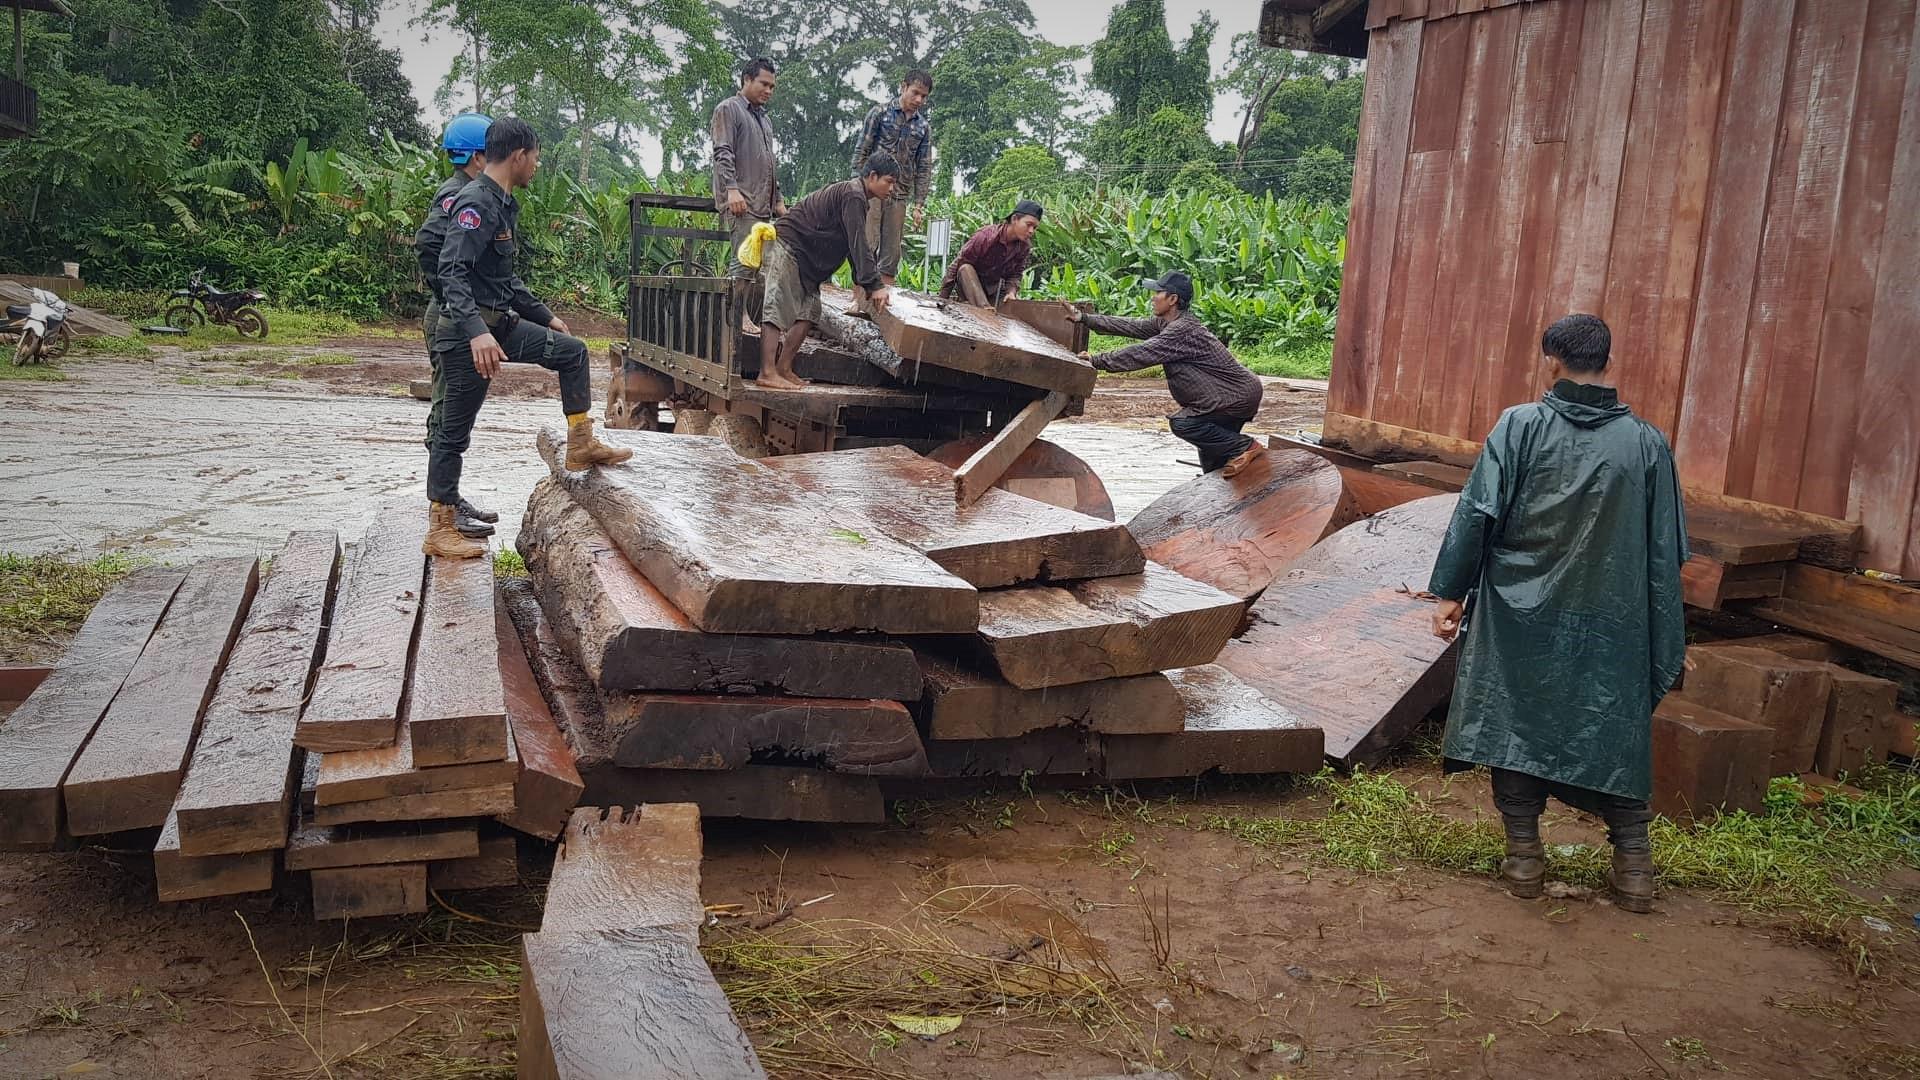 Unauthorized luxury timber